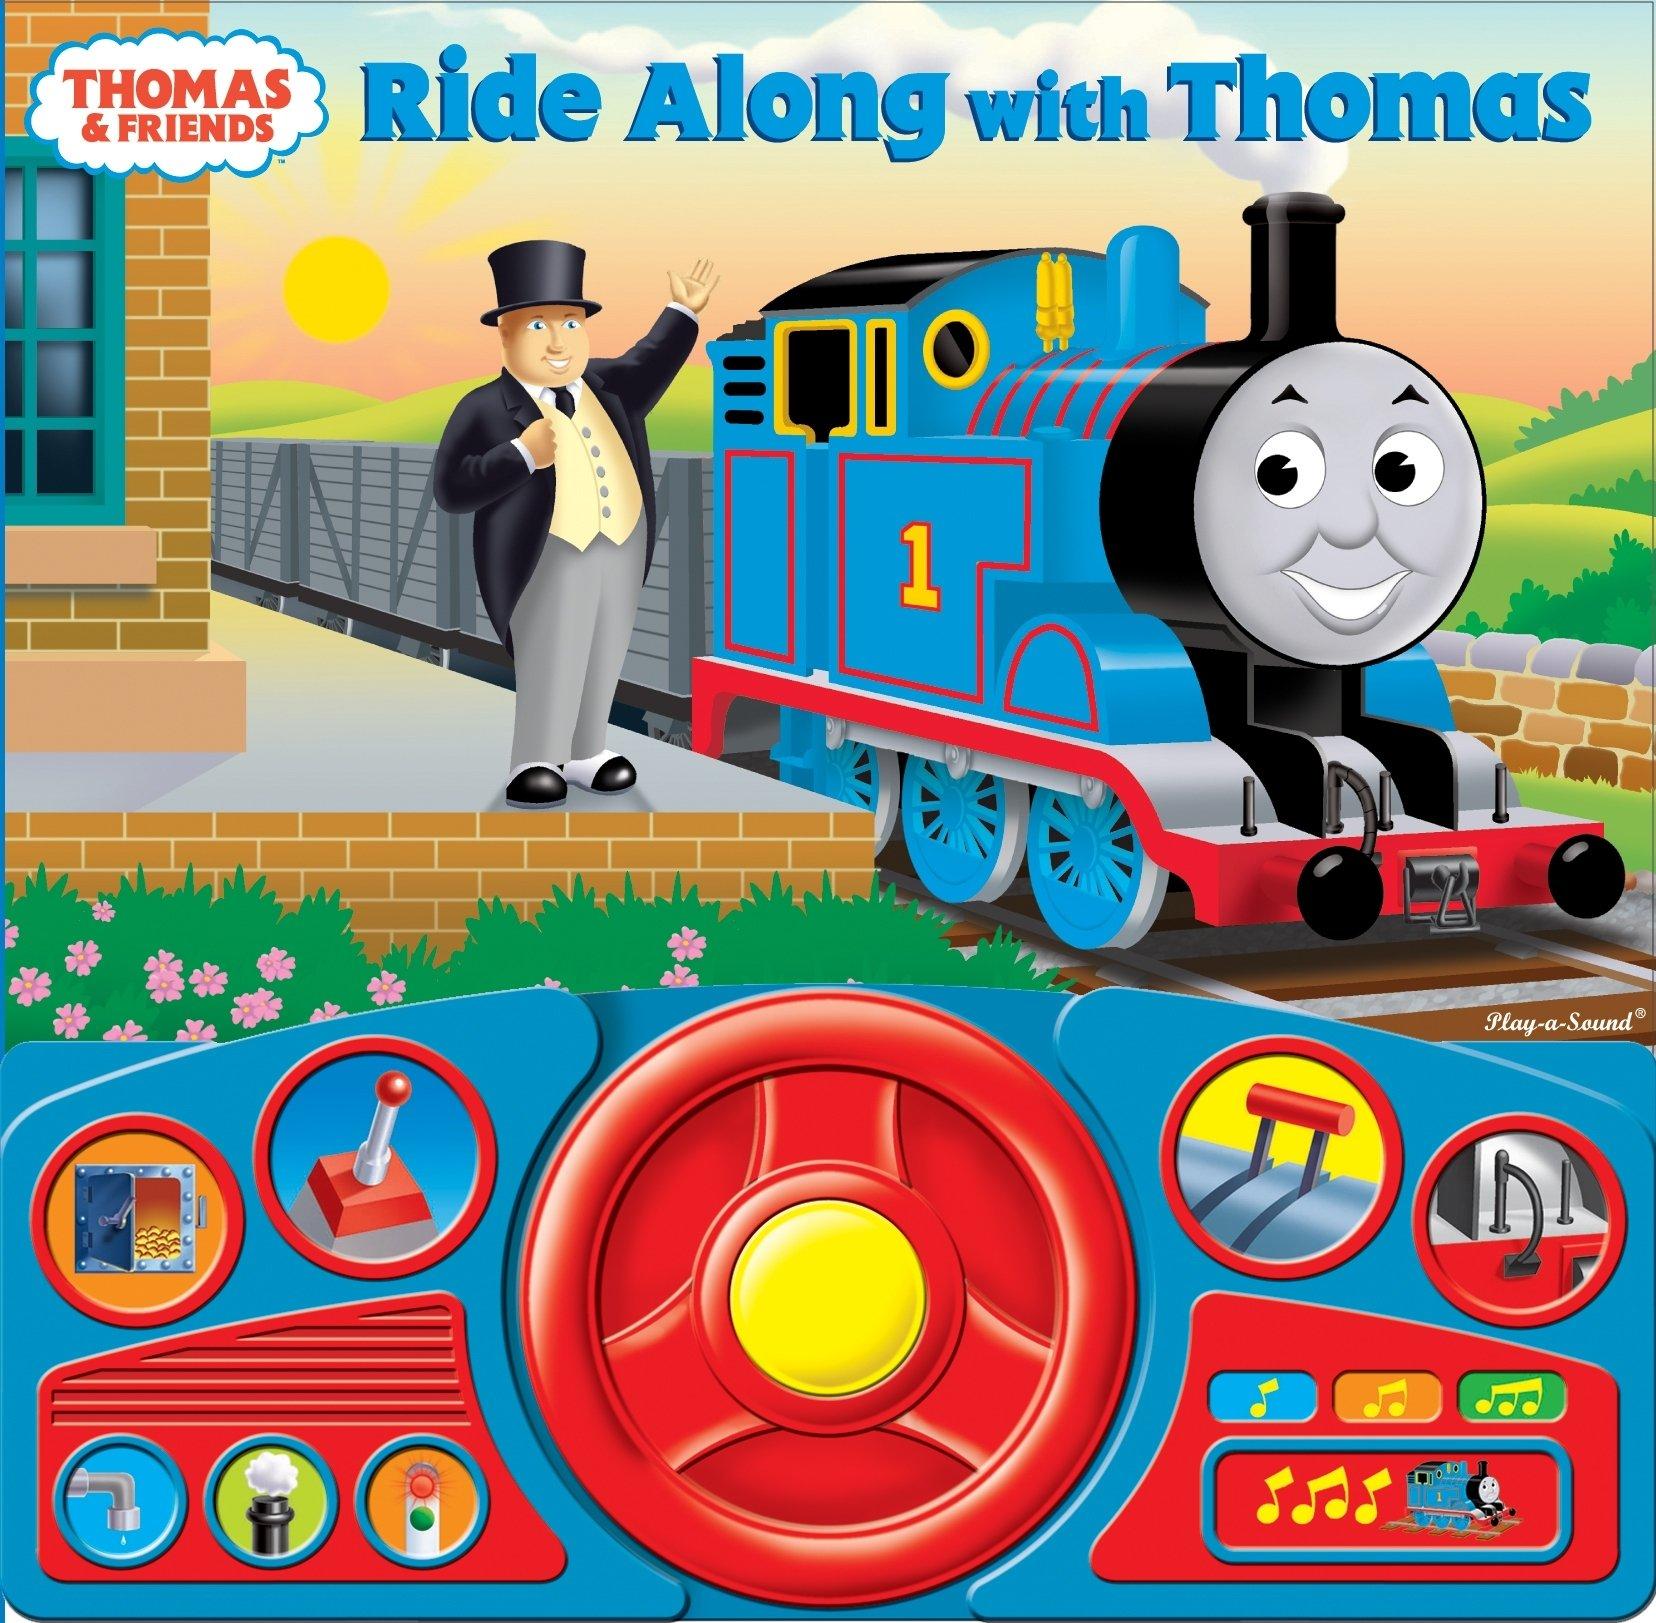 Thomas & Friends Steering Wheel Sound Book: Ride Along with Thomas (Thomas the Tank Engine) PDF ePub book